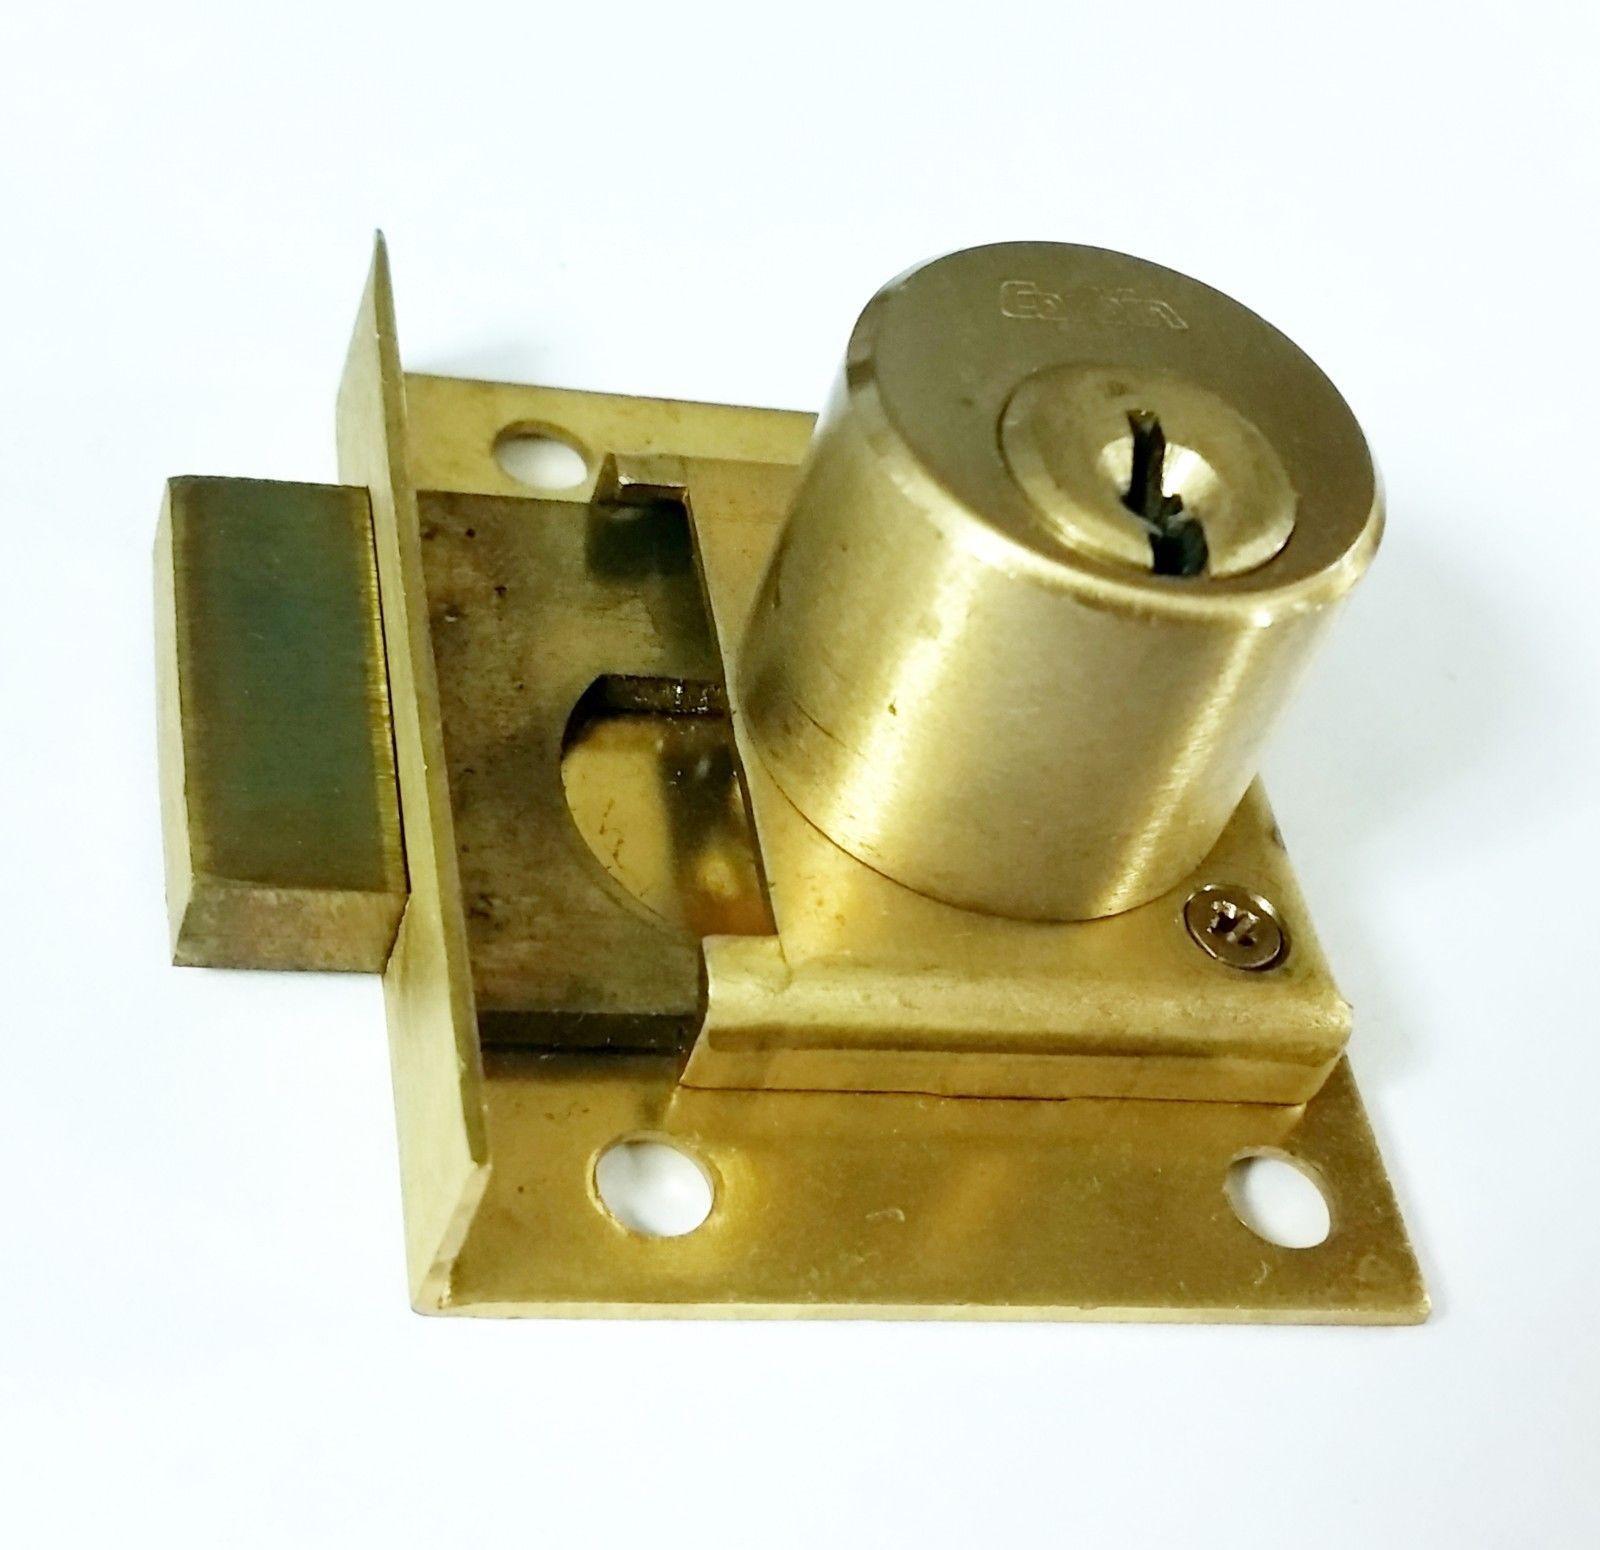 Cabinet And Drawer Locks 180961 Ccl Pin Tumbler Half Mortise Keyed Alike Lock Deadbolt Drawer Locksmith Buy It Now O Deadbolt Locksmith Emergency Locksmith